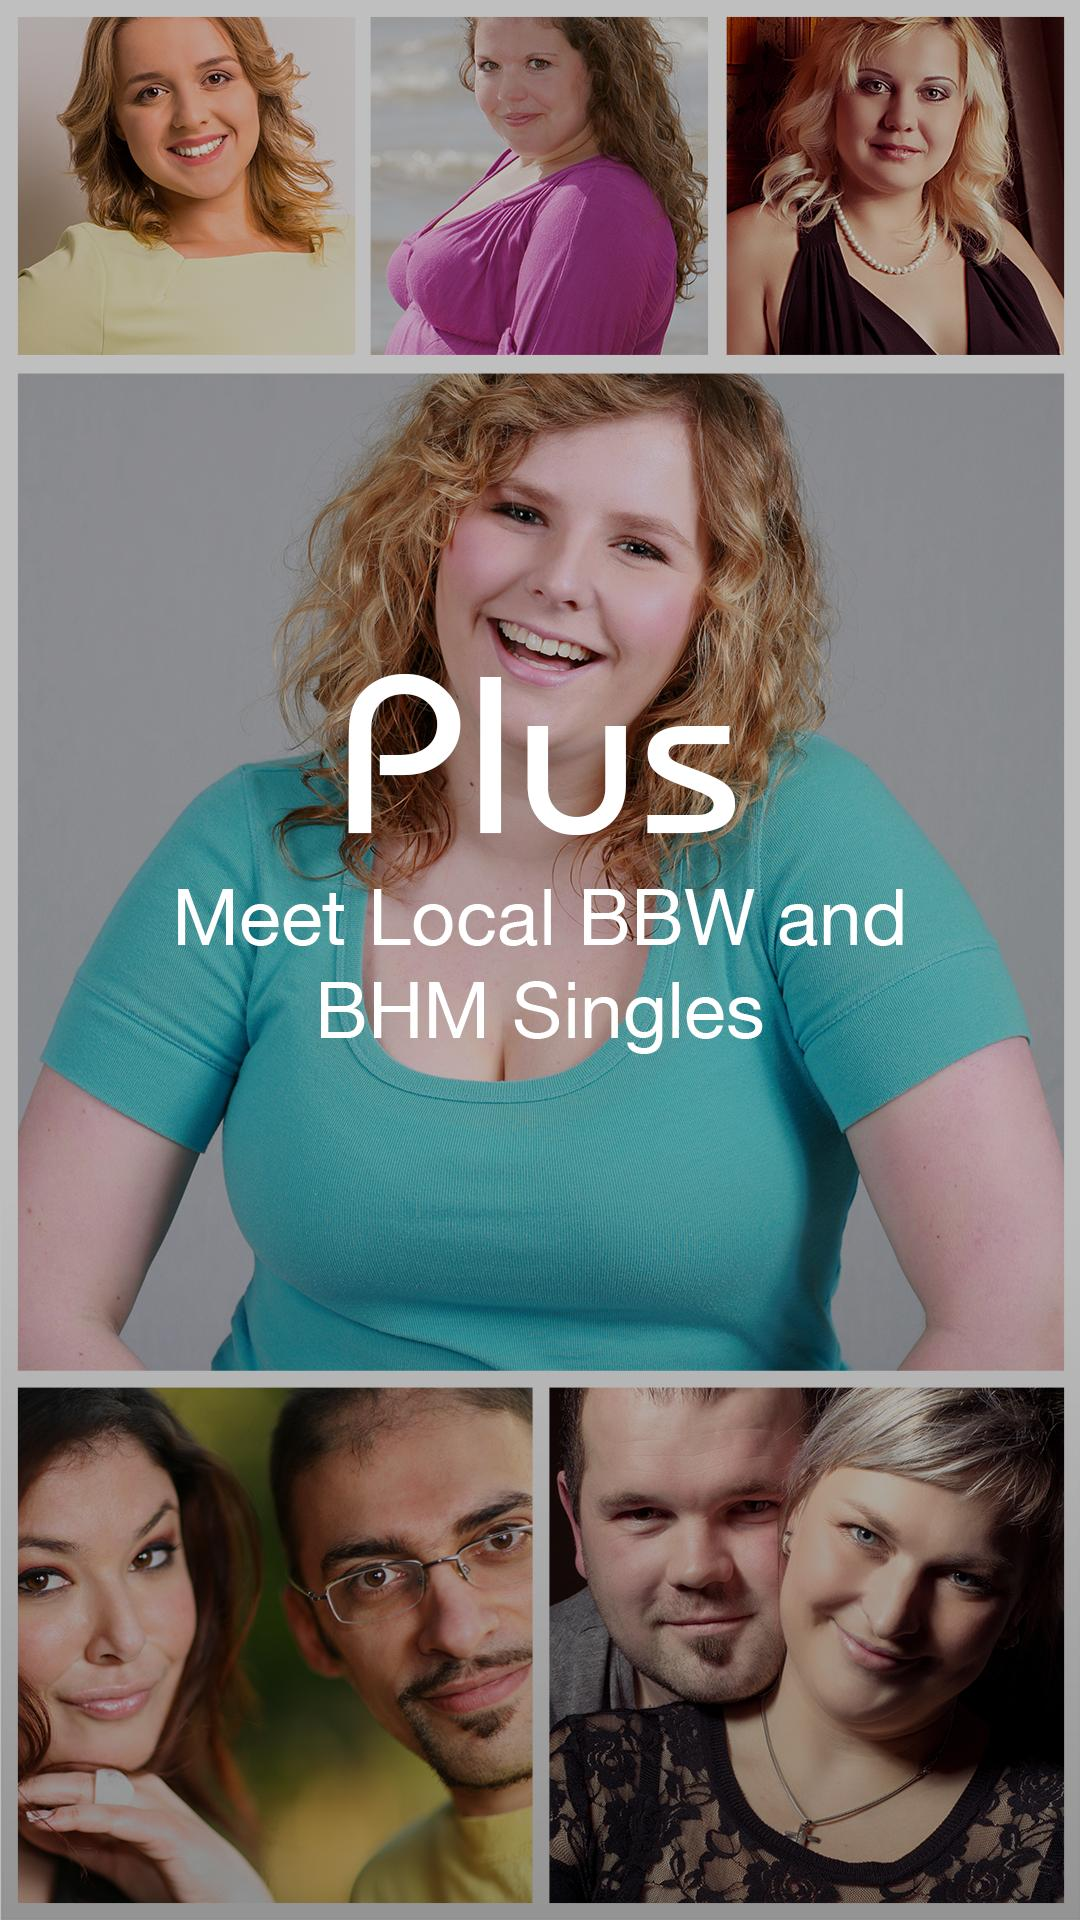 match com american dating sites